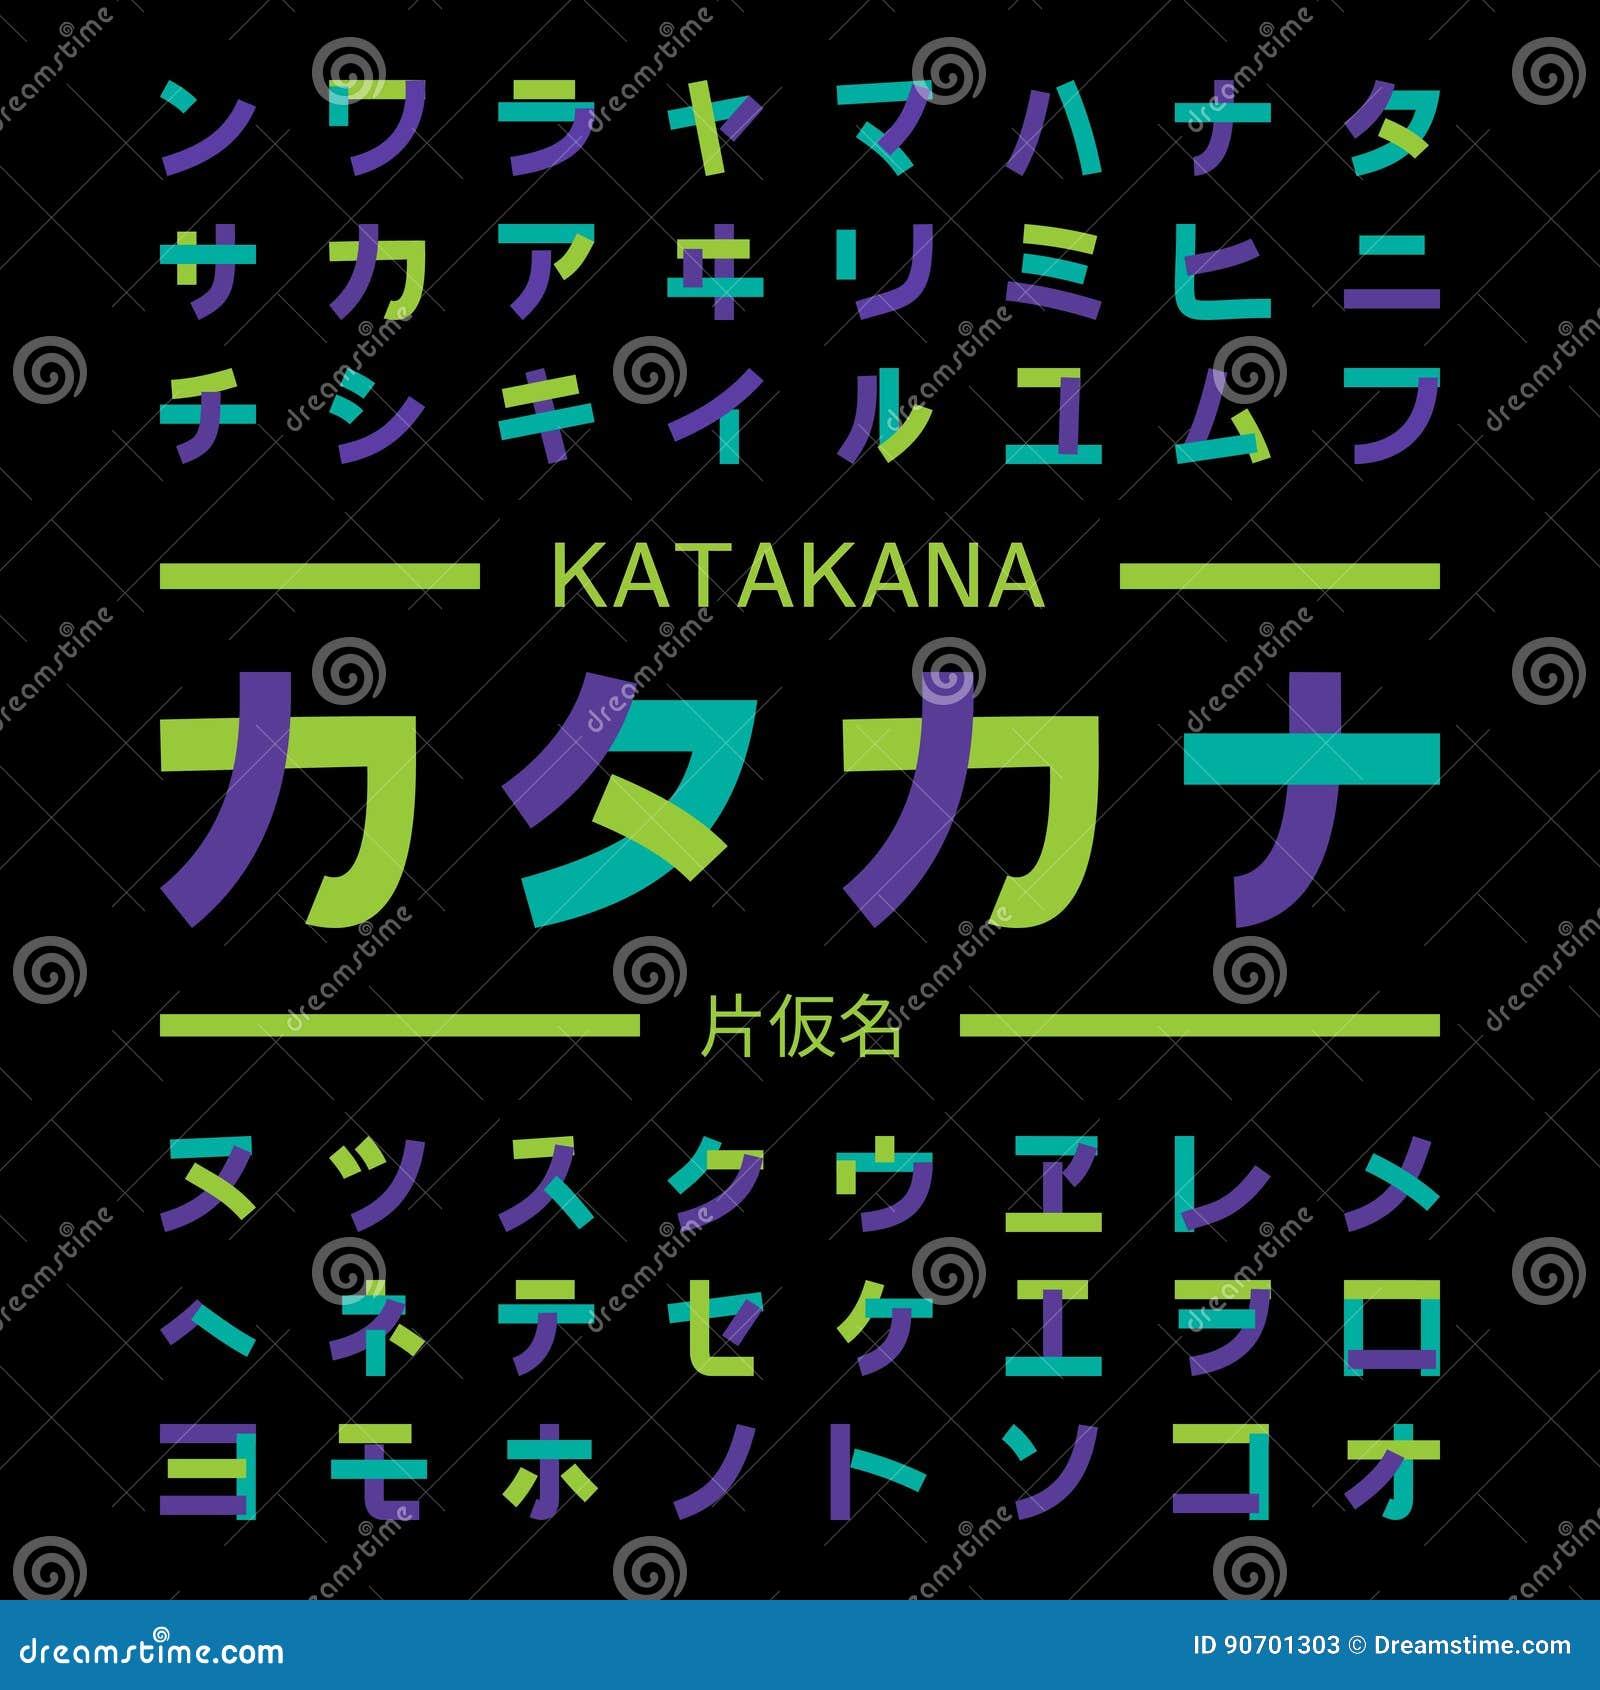 Katakana Symbols Japanese Alphabet Stock Vector Illustration Of